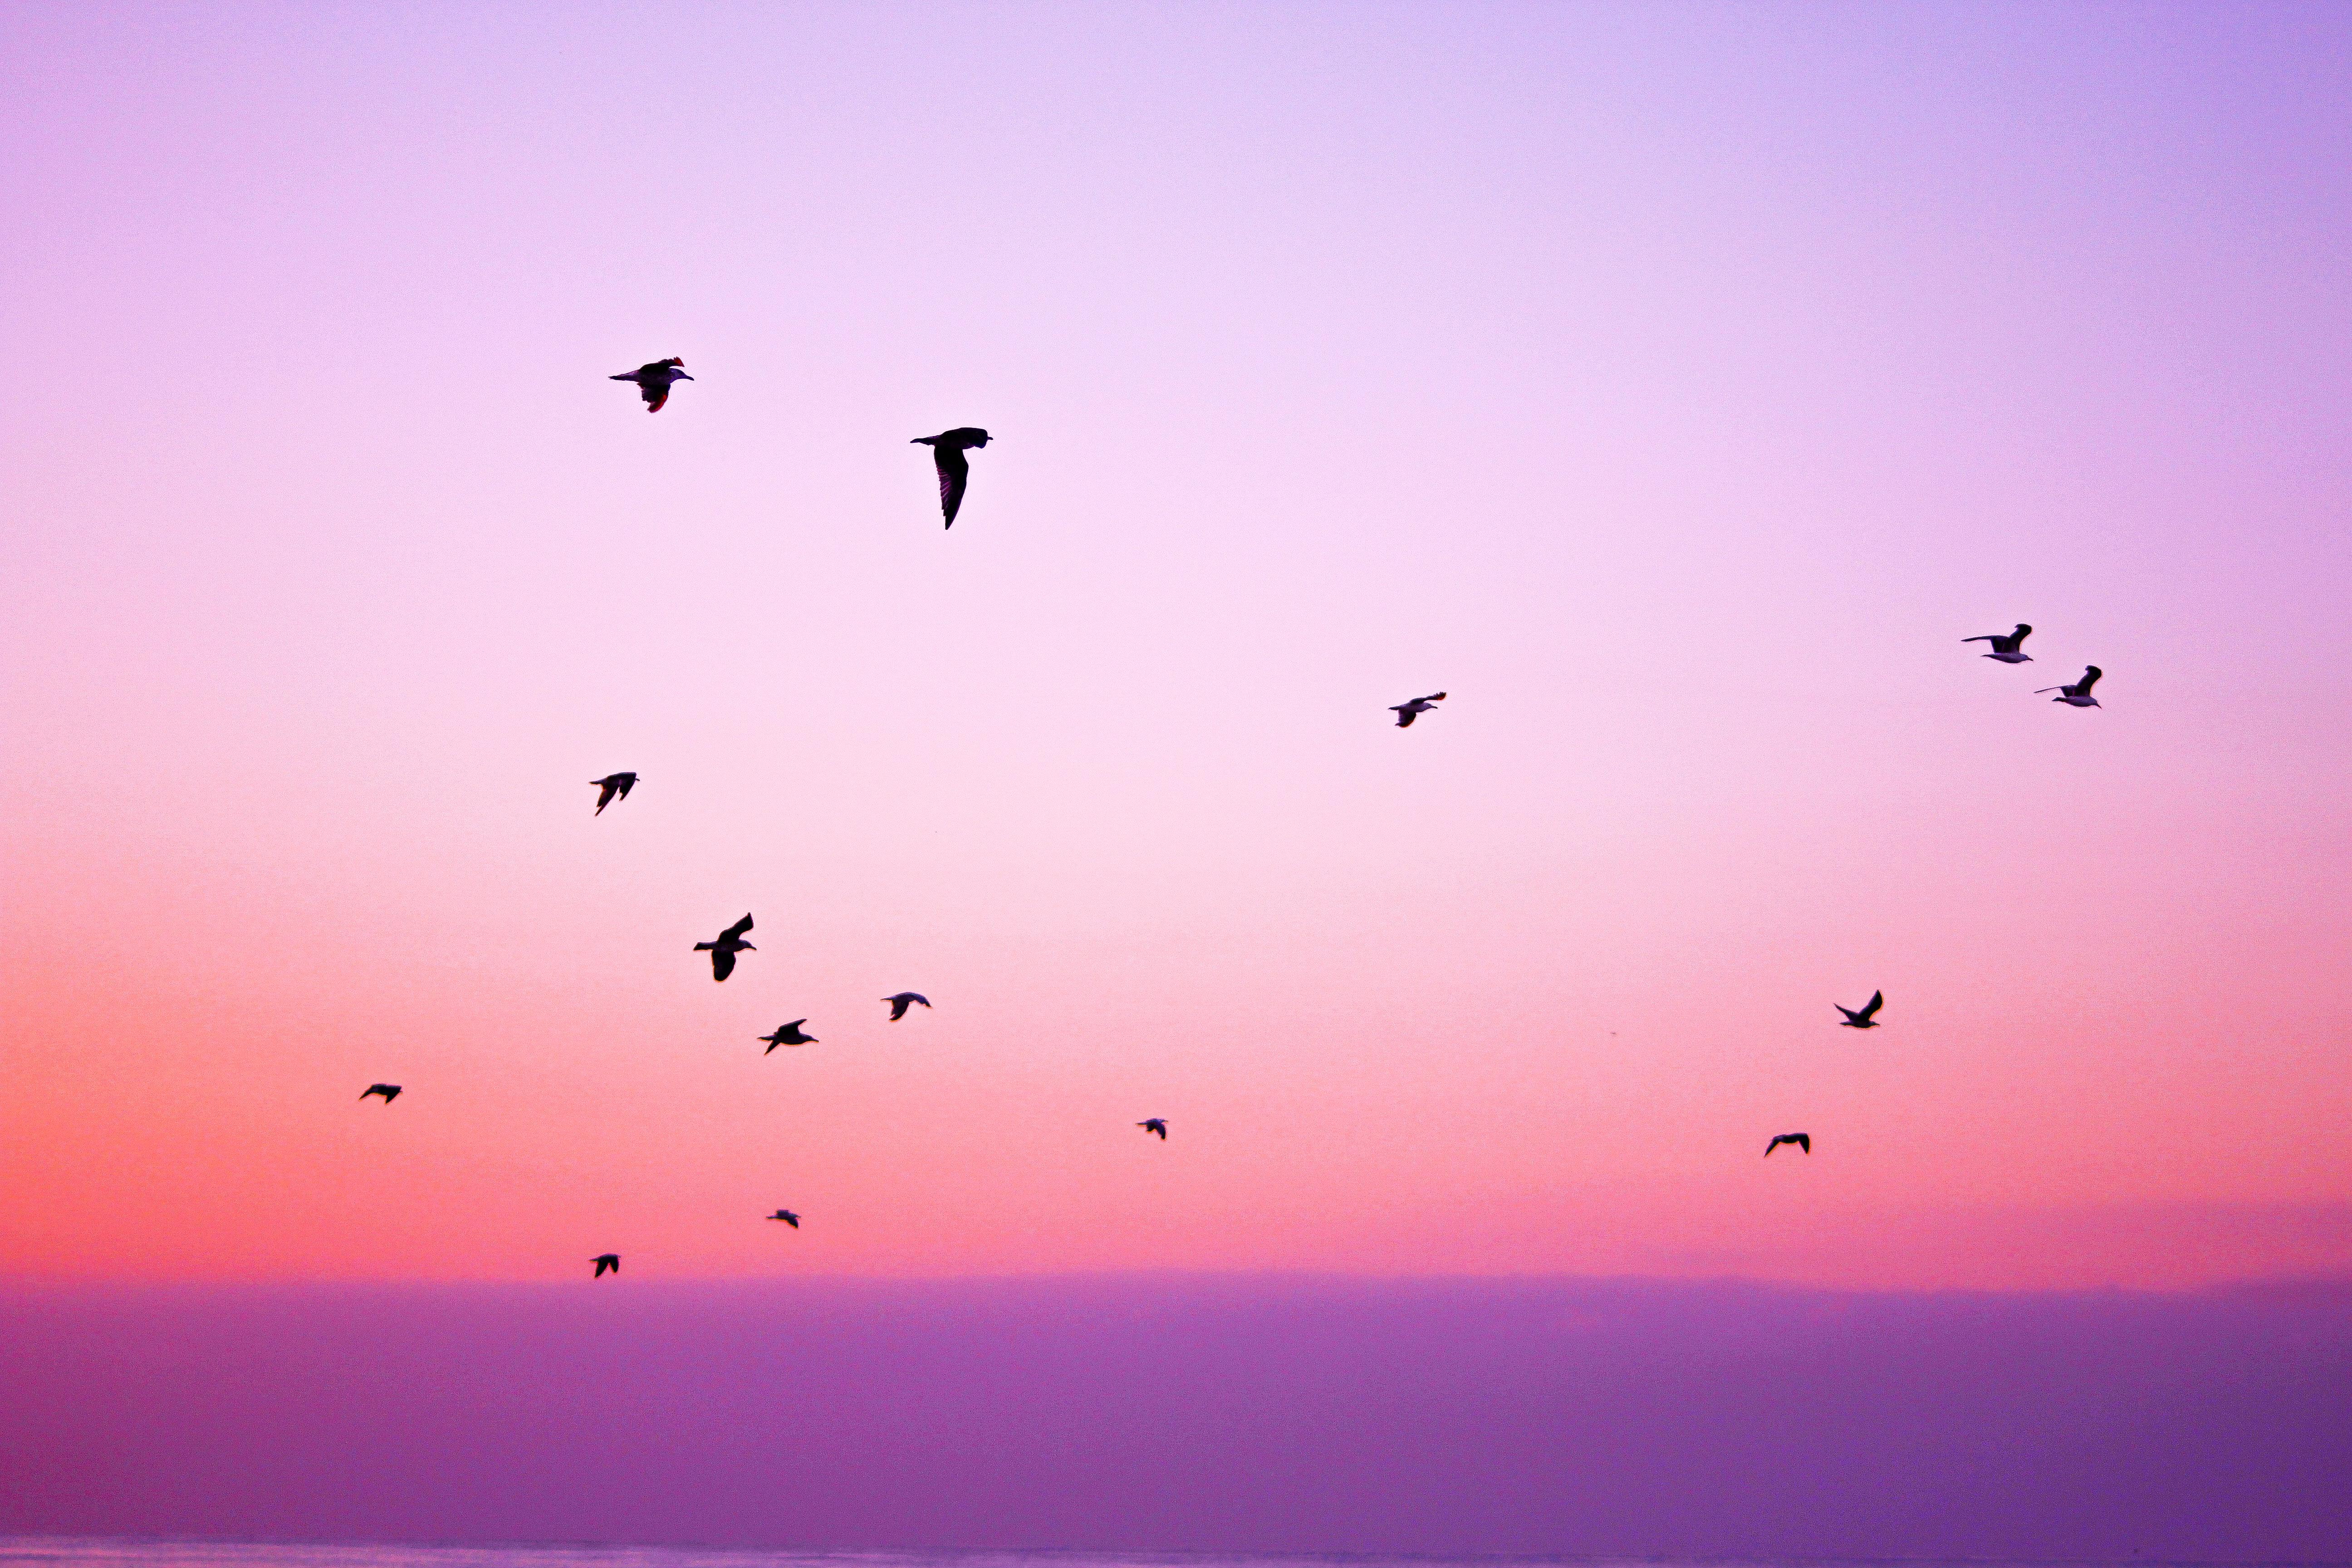 Which type of bird are you - lark, owl, hummingbird